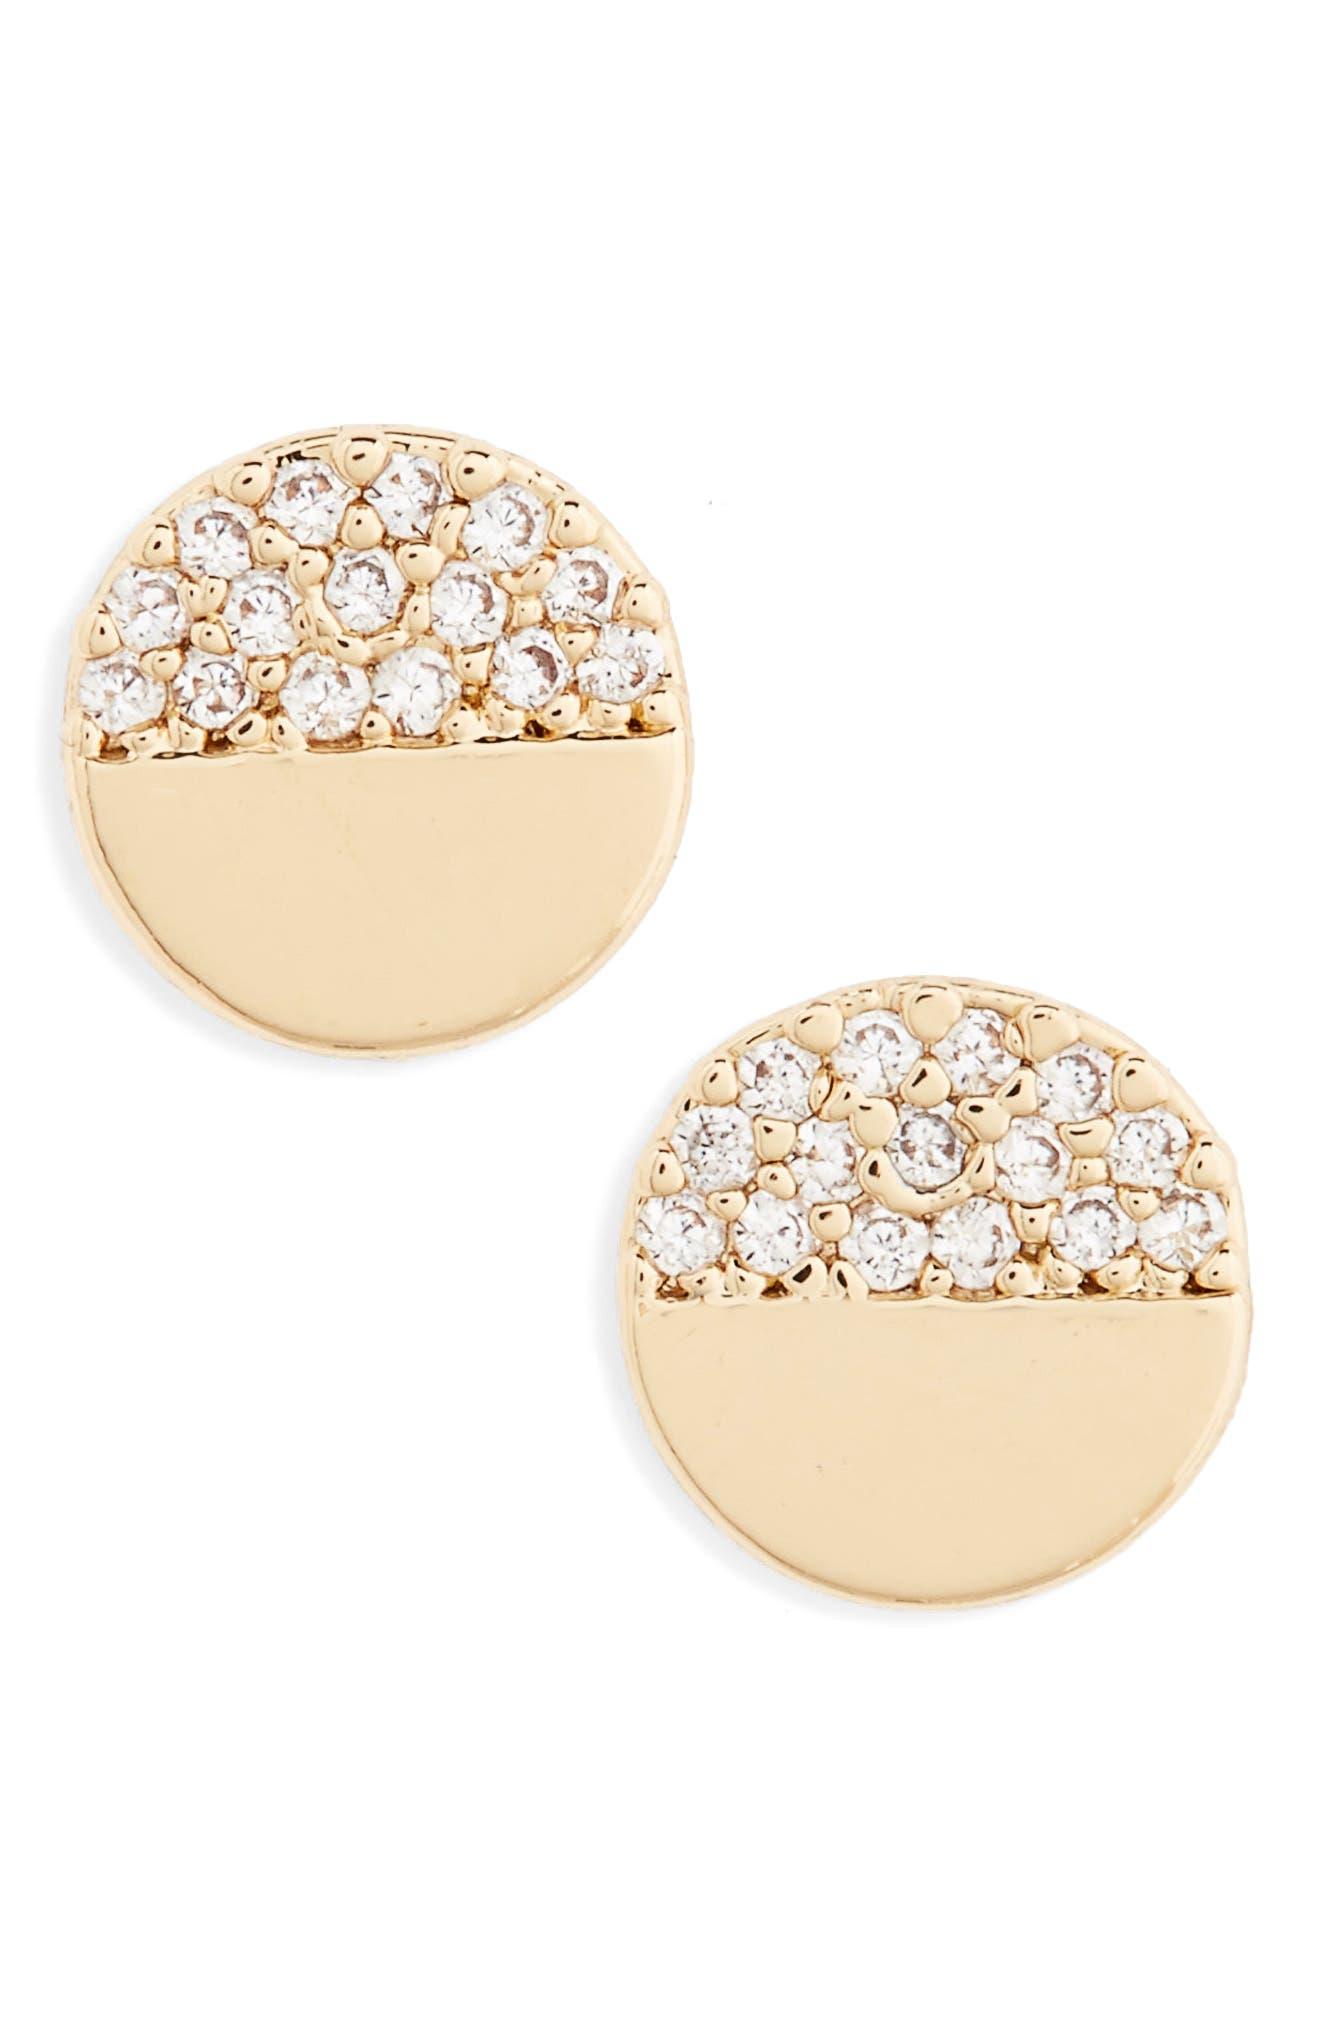 Main Image - BP. Circle Stud Earrings